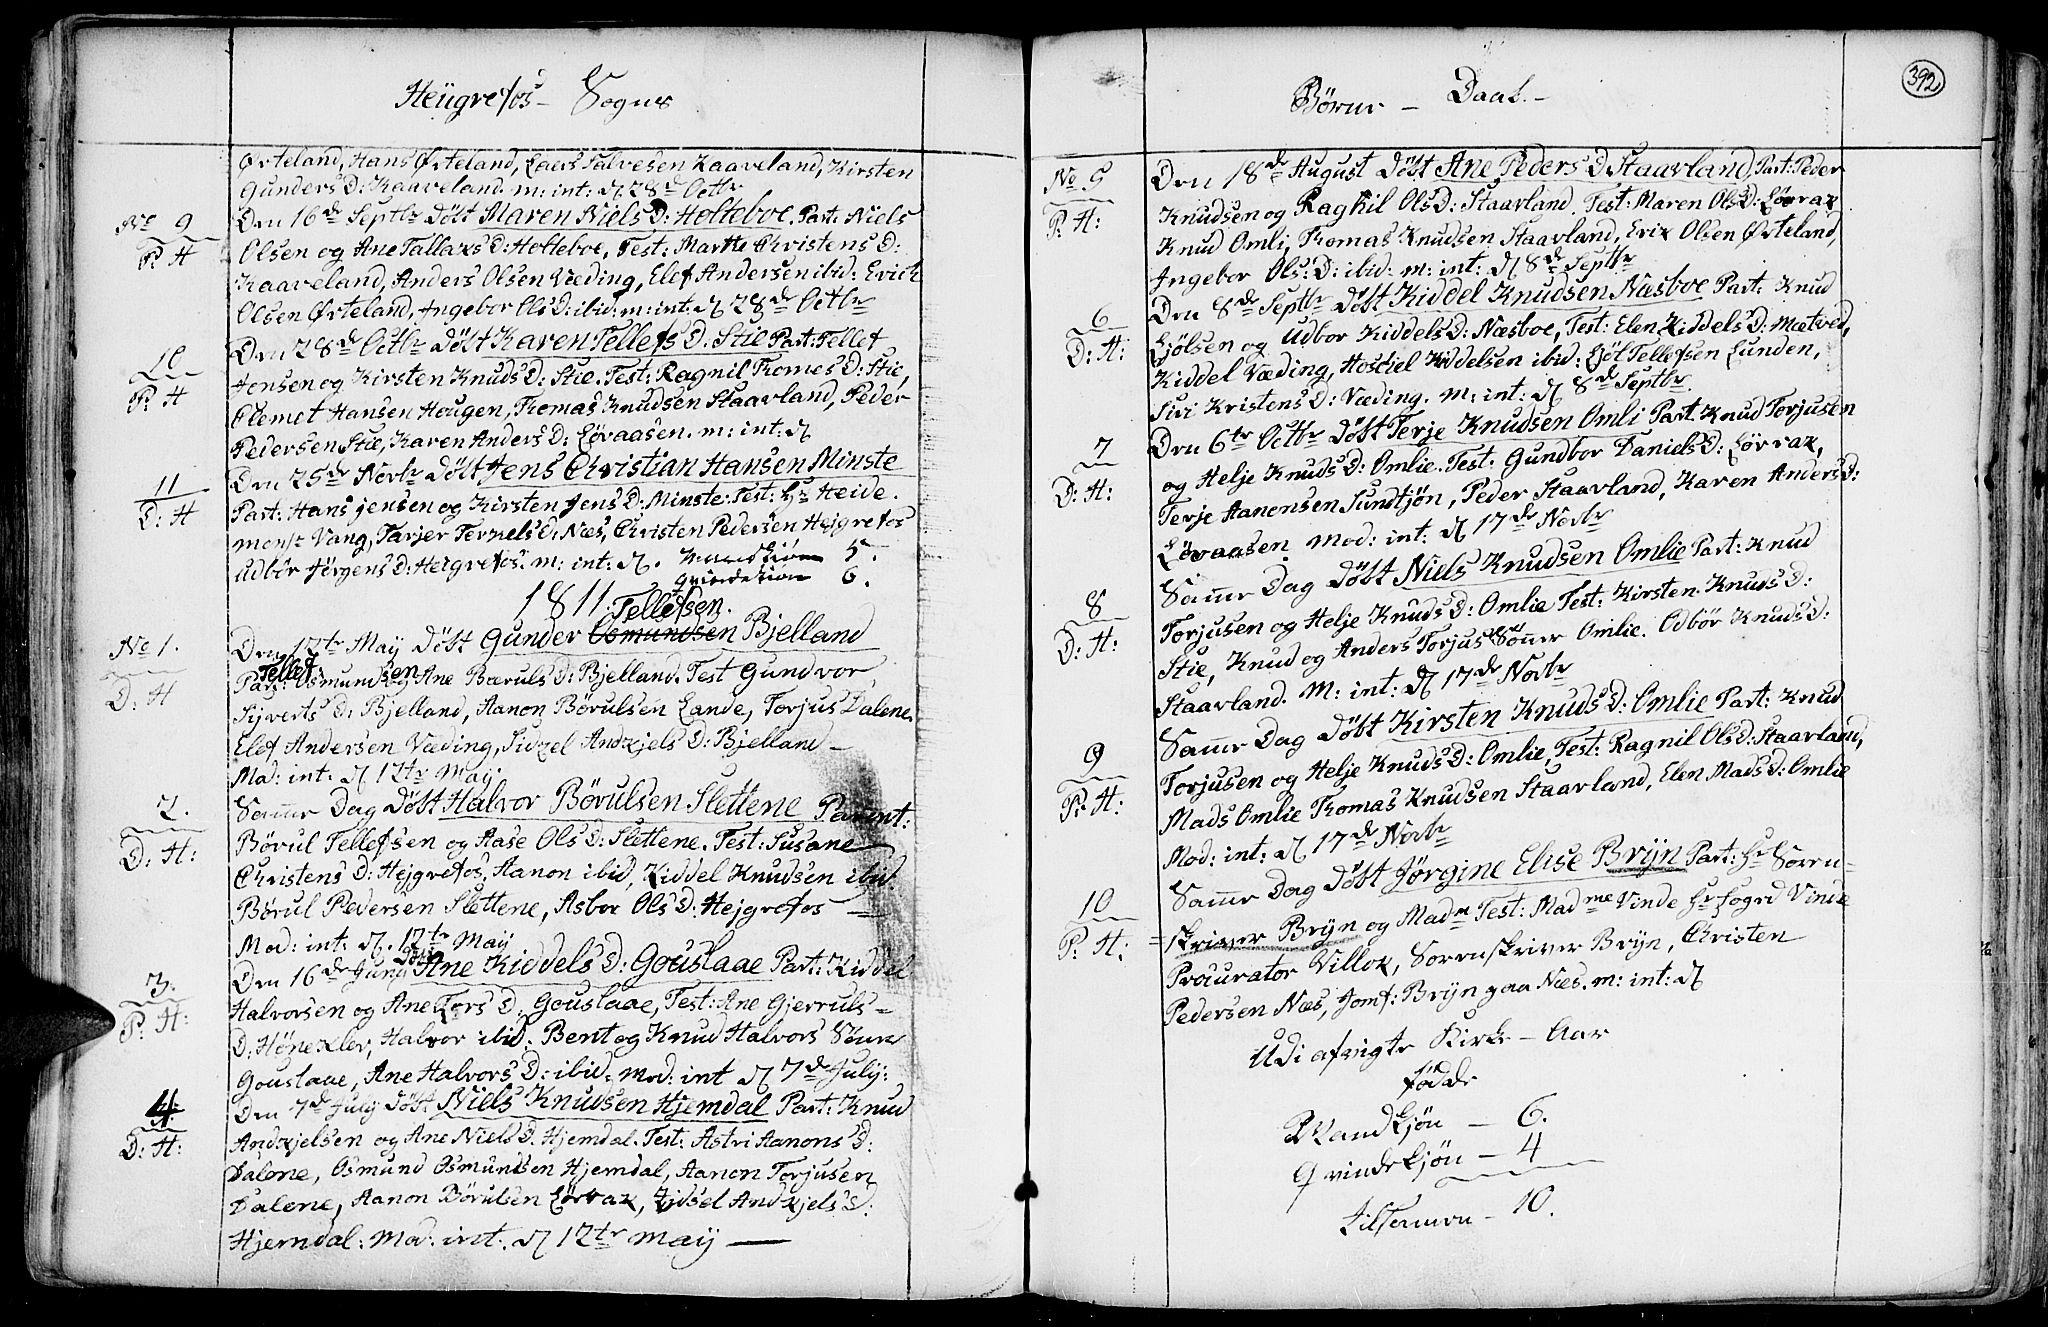 SAK, Hommedal sokneprestkontor, F/Fa/Fab/L0002: Ministerialbok nr. A 2 /3, 1740-1821, s. 392